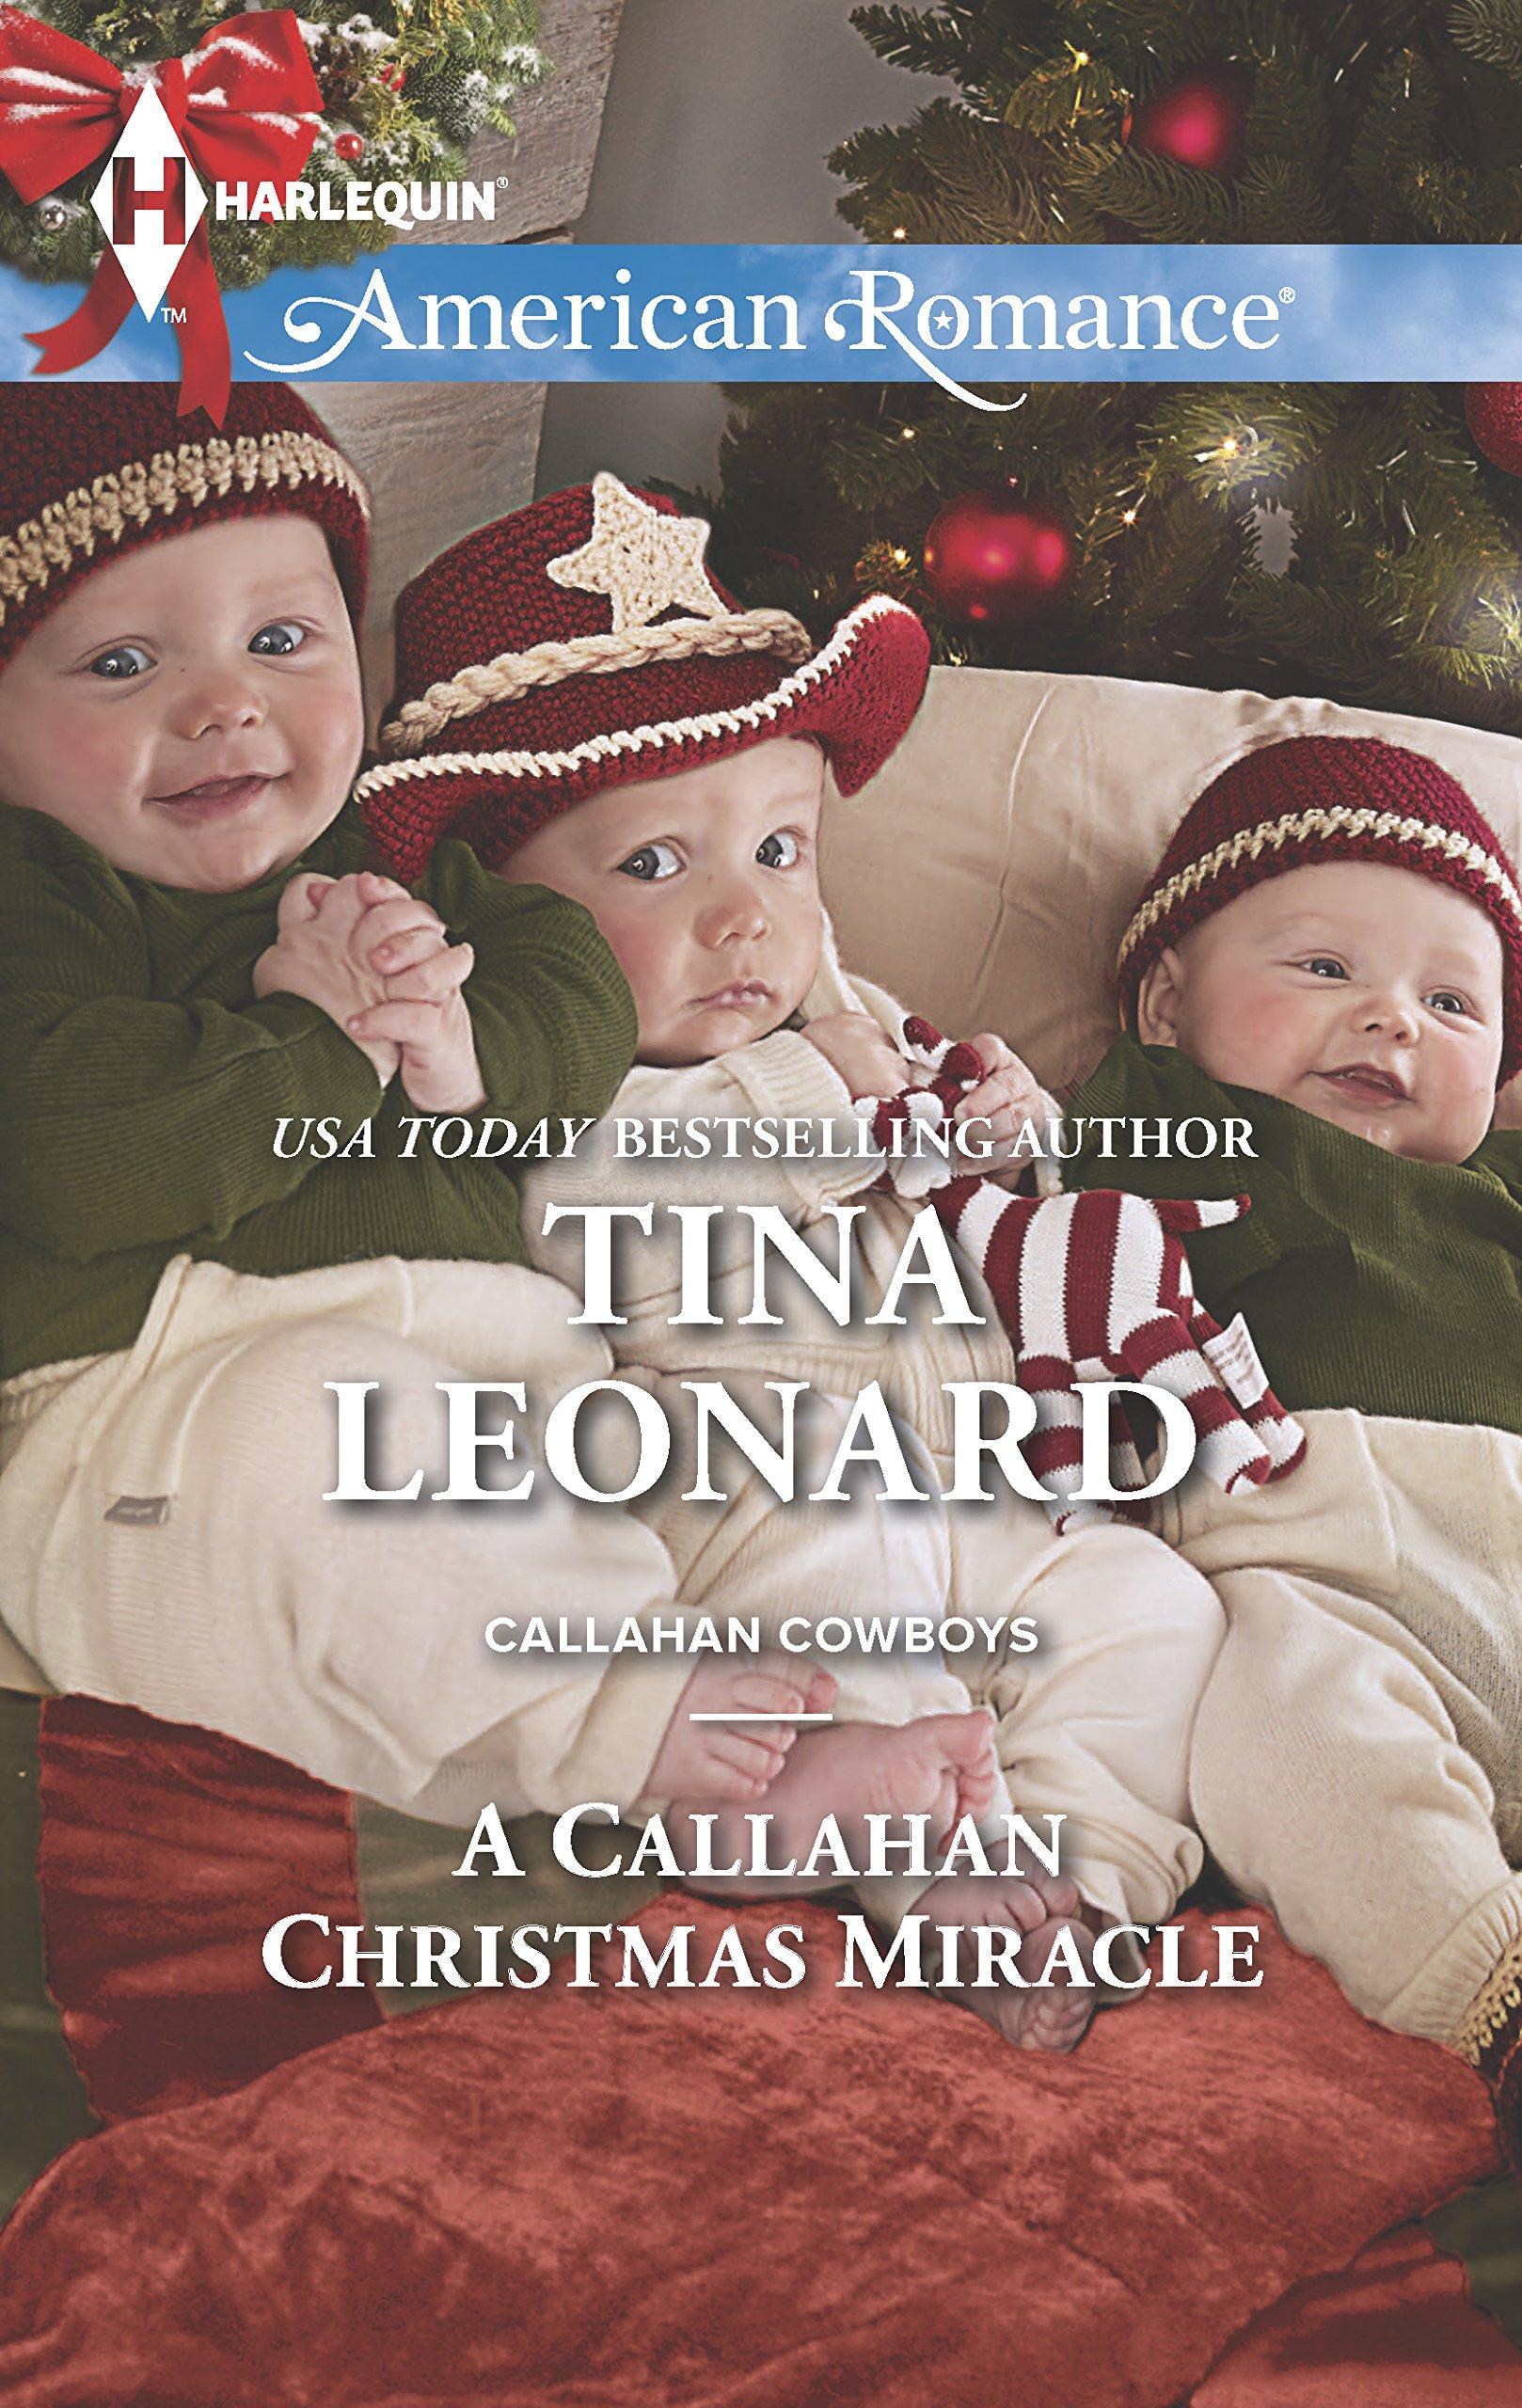 Amazon.com: A Callahan Christmas Miracle (Callahan Cowboys)  (9780373754779): Tina Leonard: Books